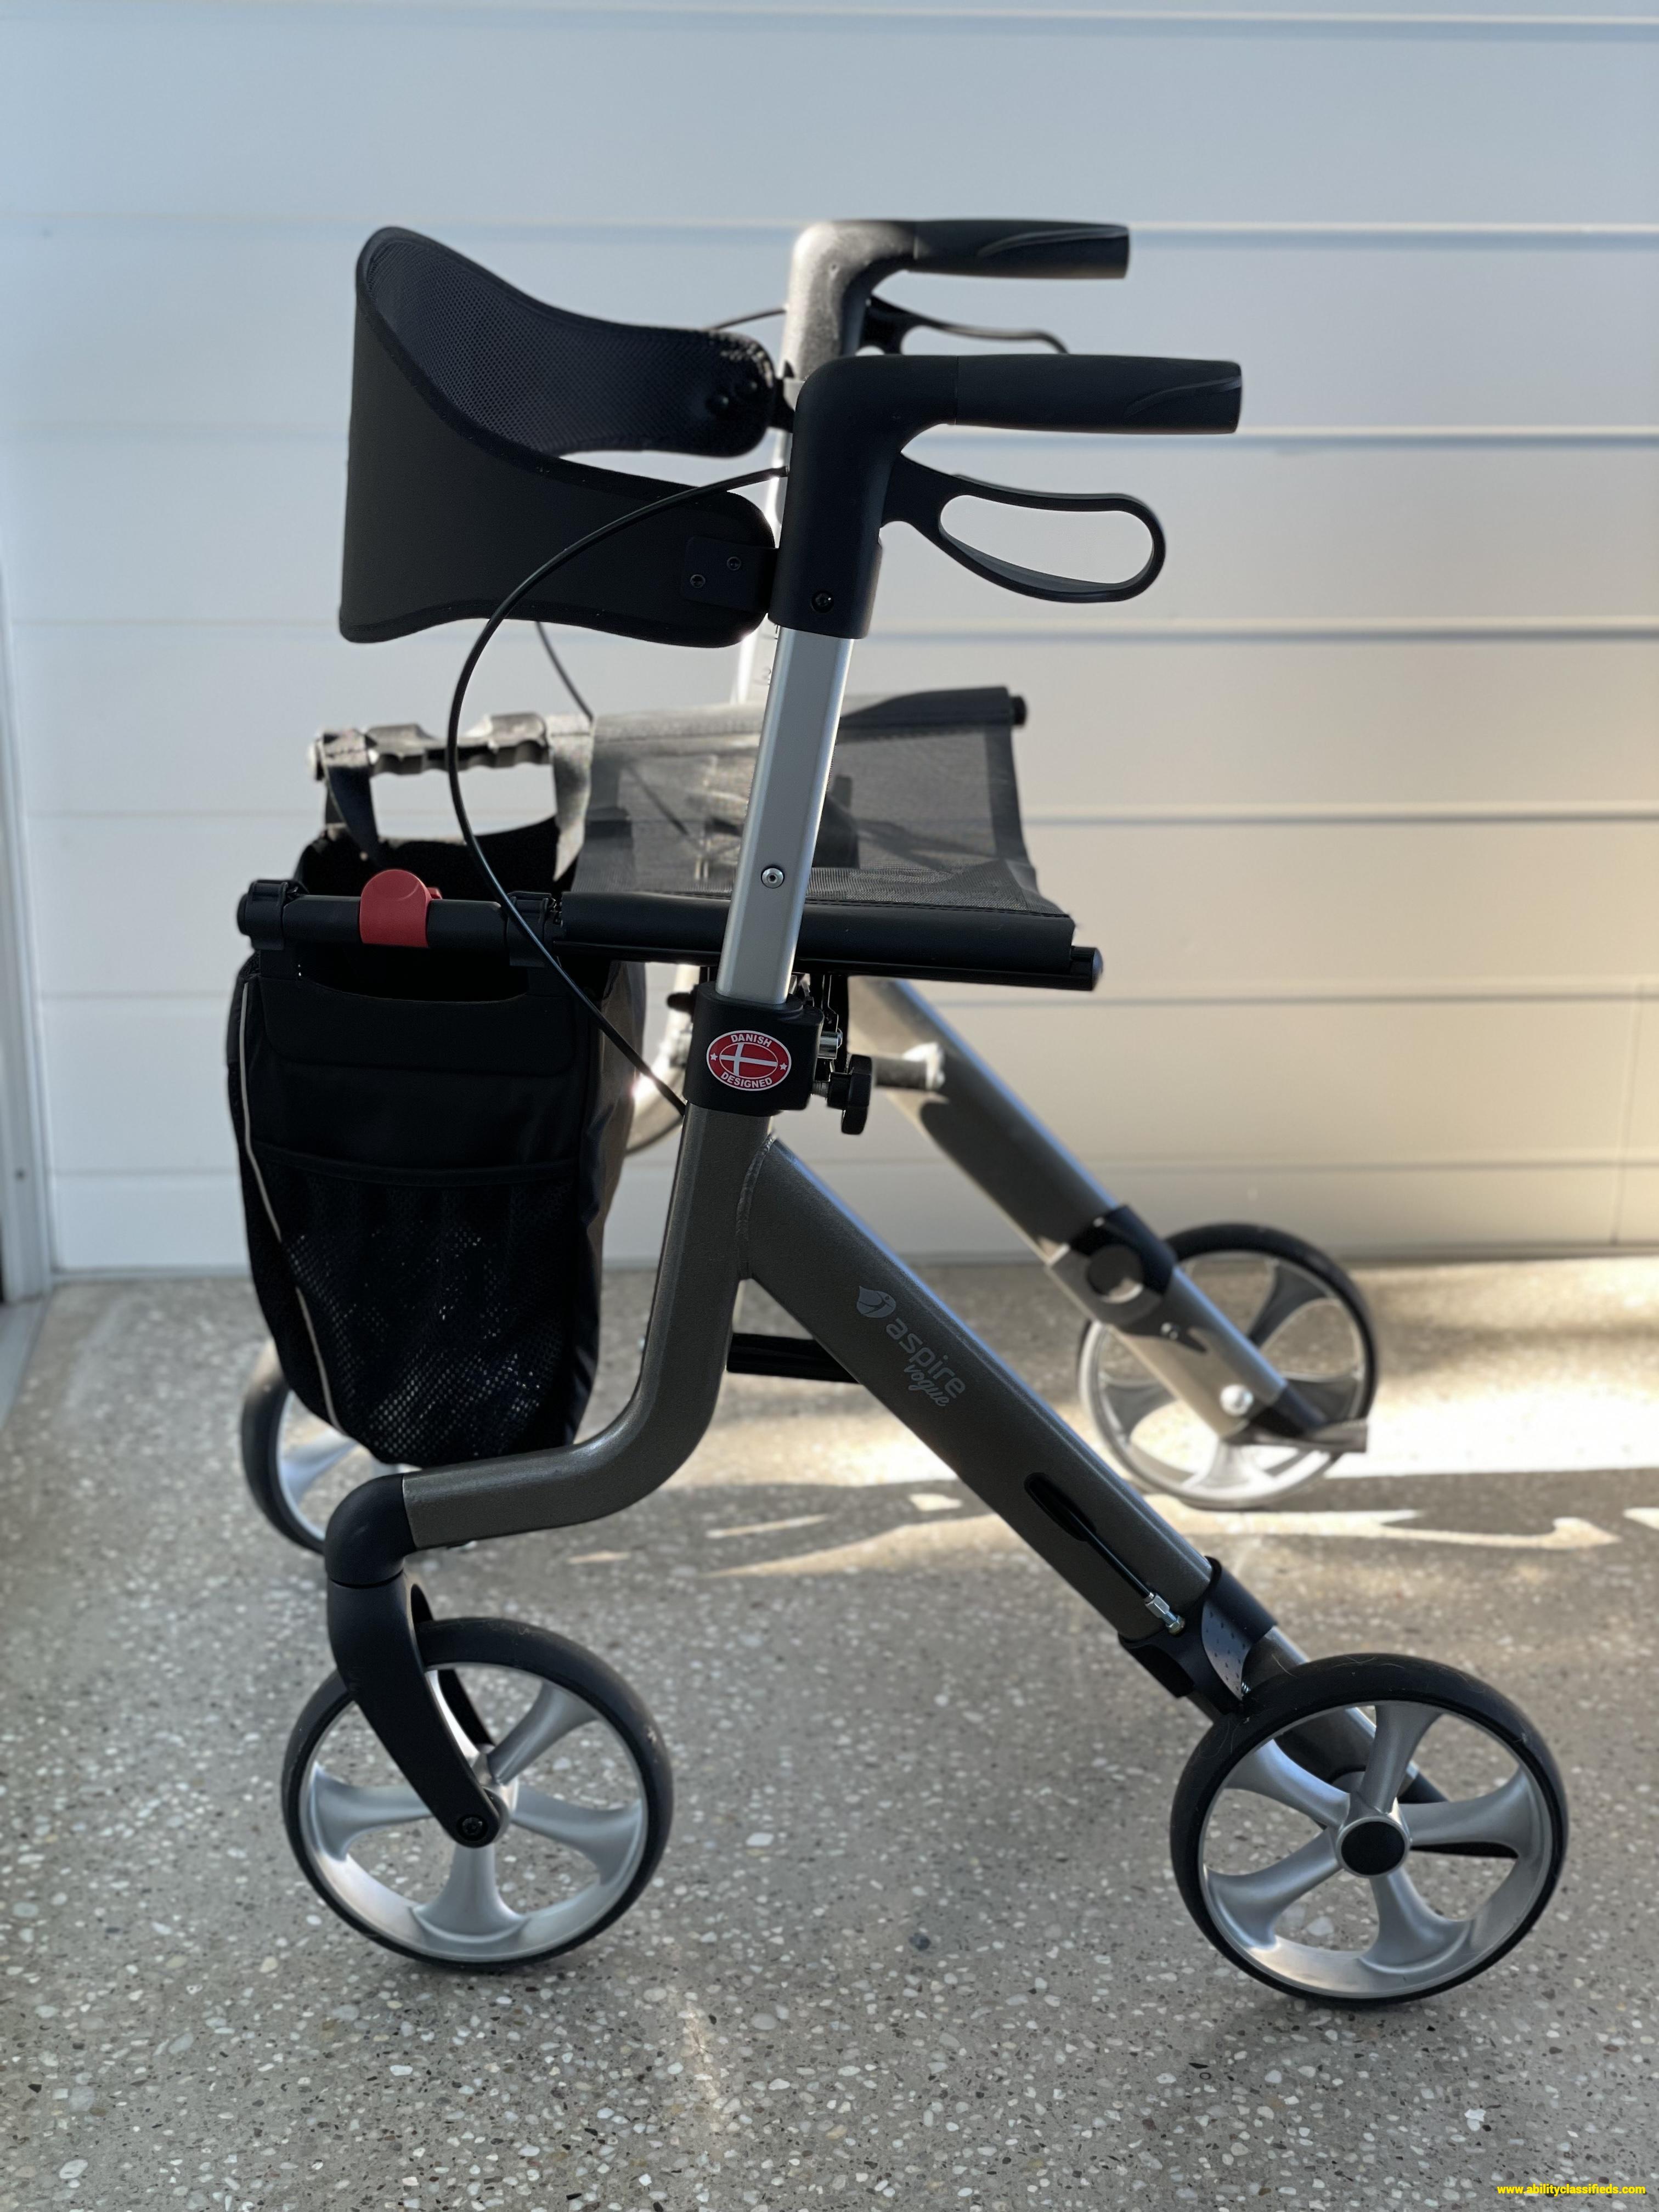 Aspire Vogue Mobility Walker